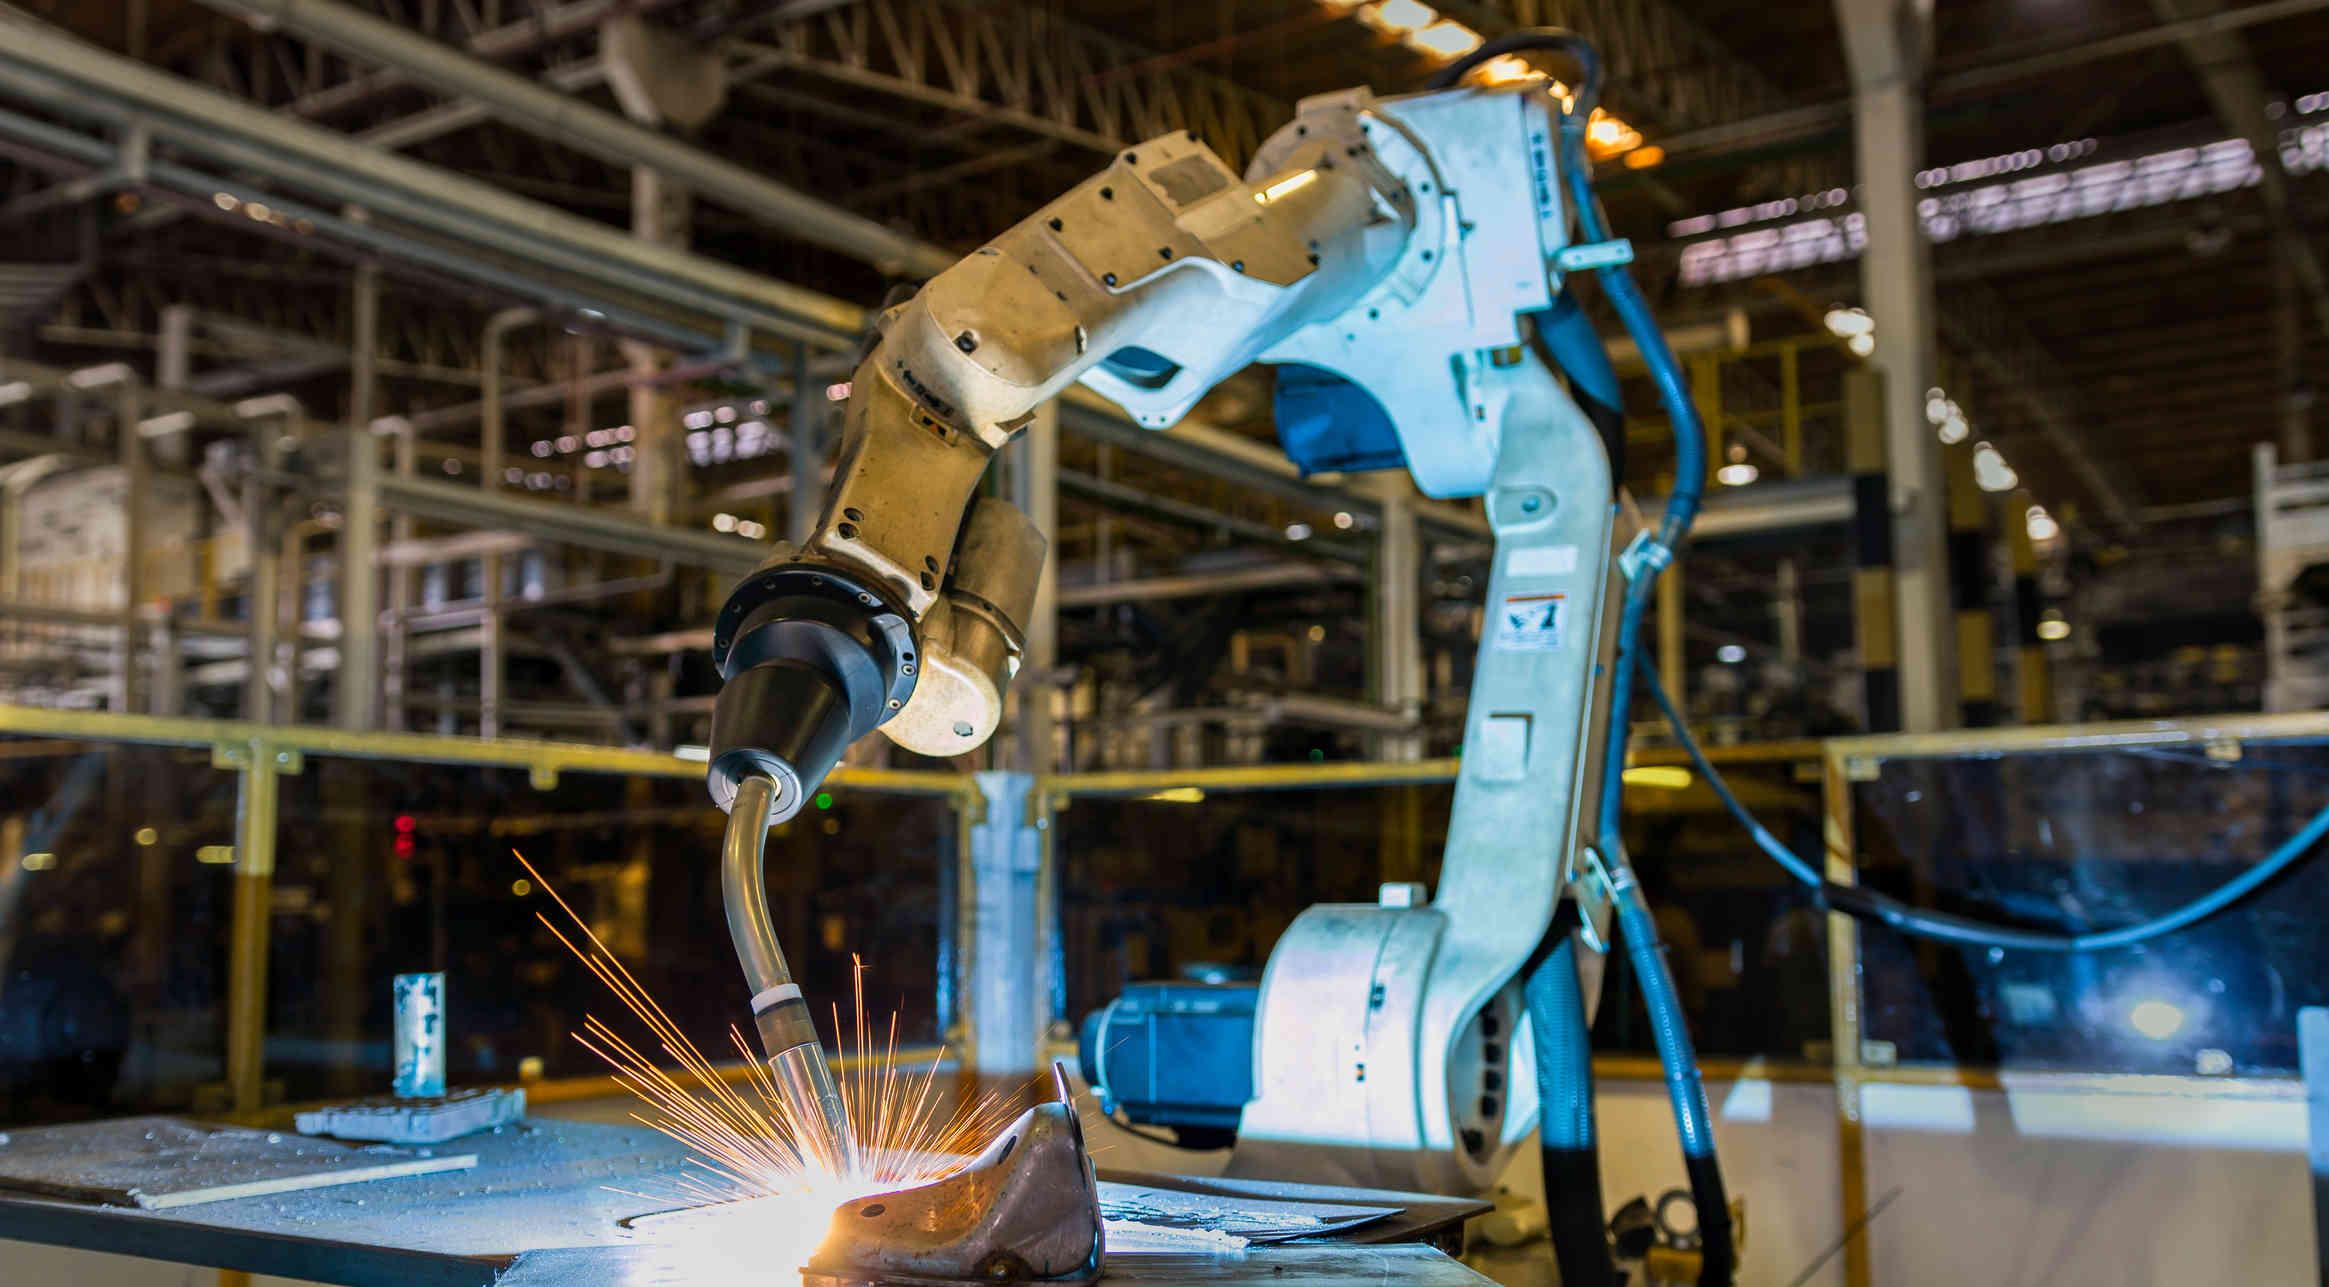 Vision Guided Robotics : Innovation Meets Precision to Power Industrial Revolution 4.0